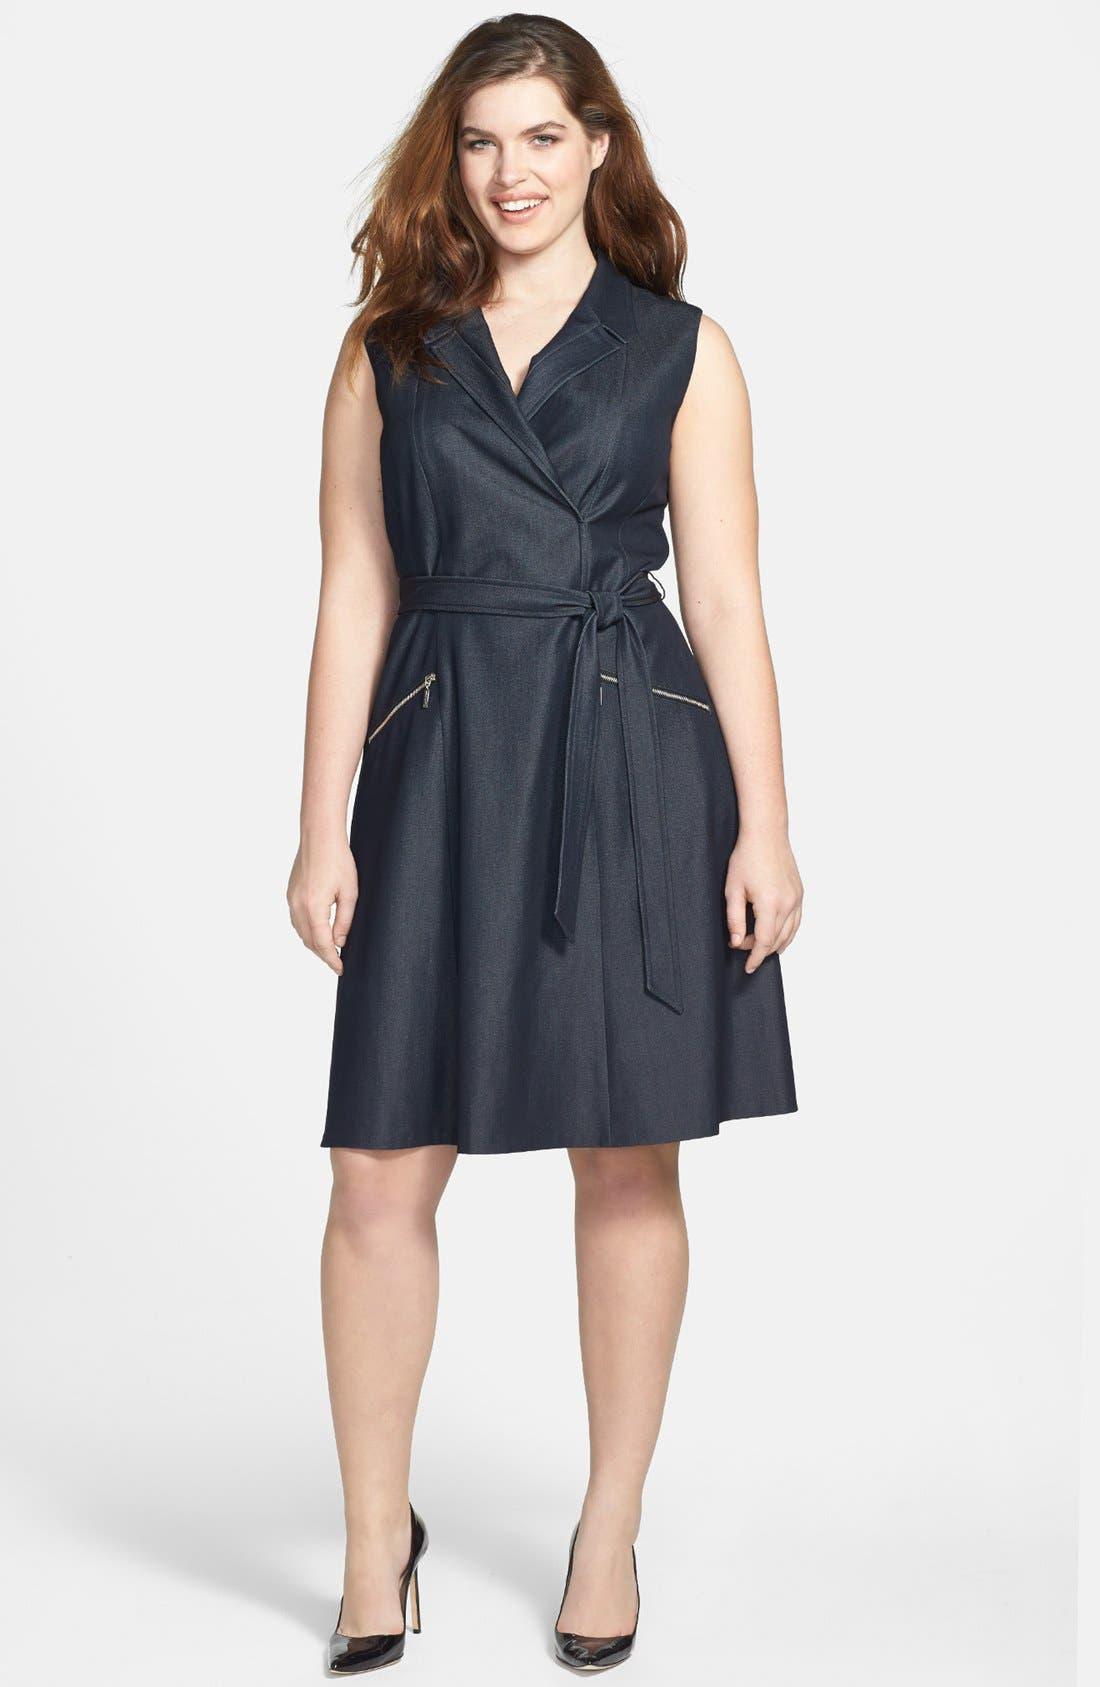 Alternate Image 1 Selected - Calvin Klein Sleeveless Tie Waist Shirtdress (Plus Size)